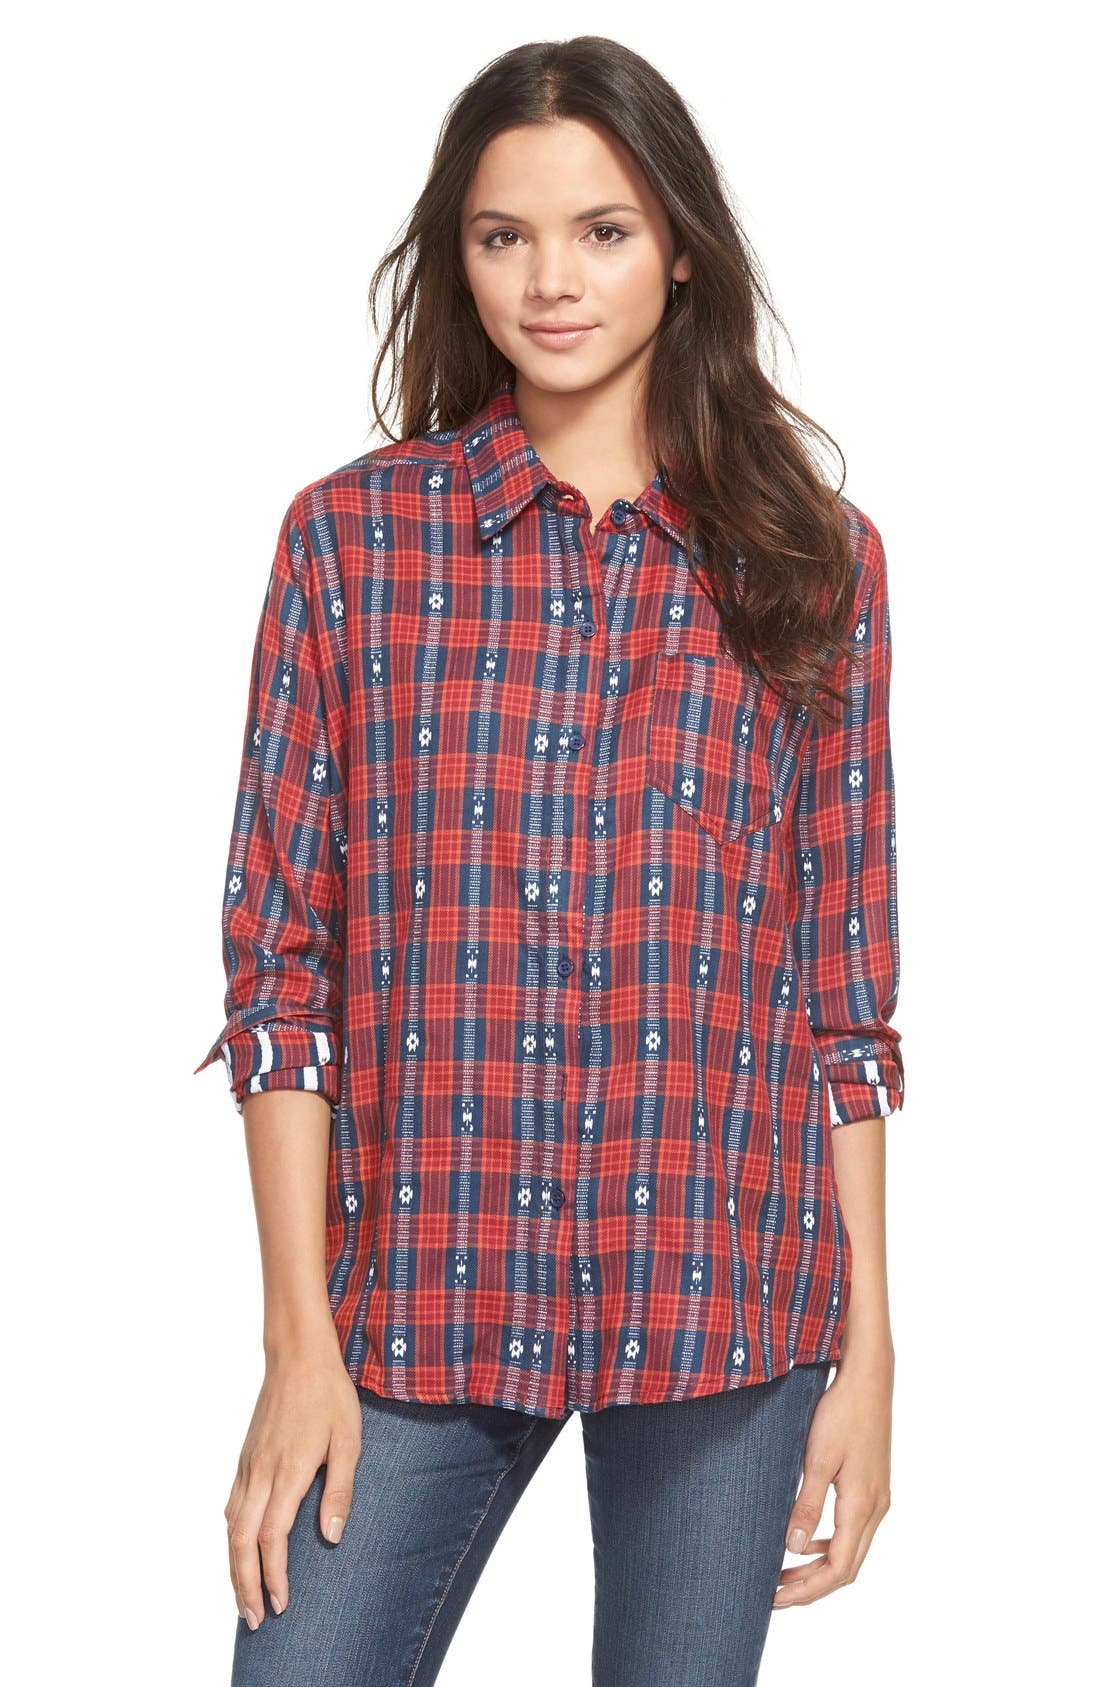 Embroidered Plaid Shirt,                             Main thumbnail 1, color,                             625